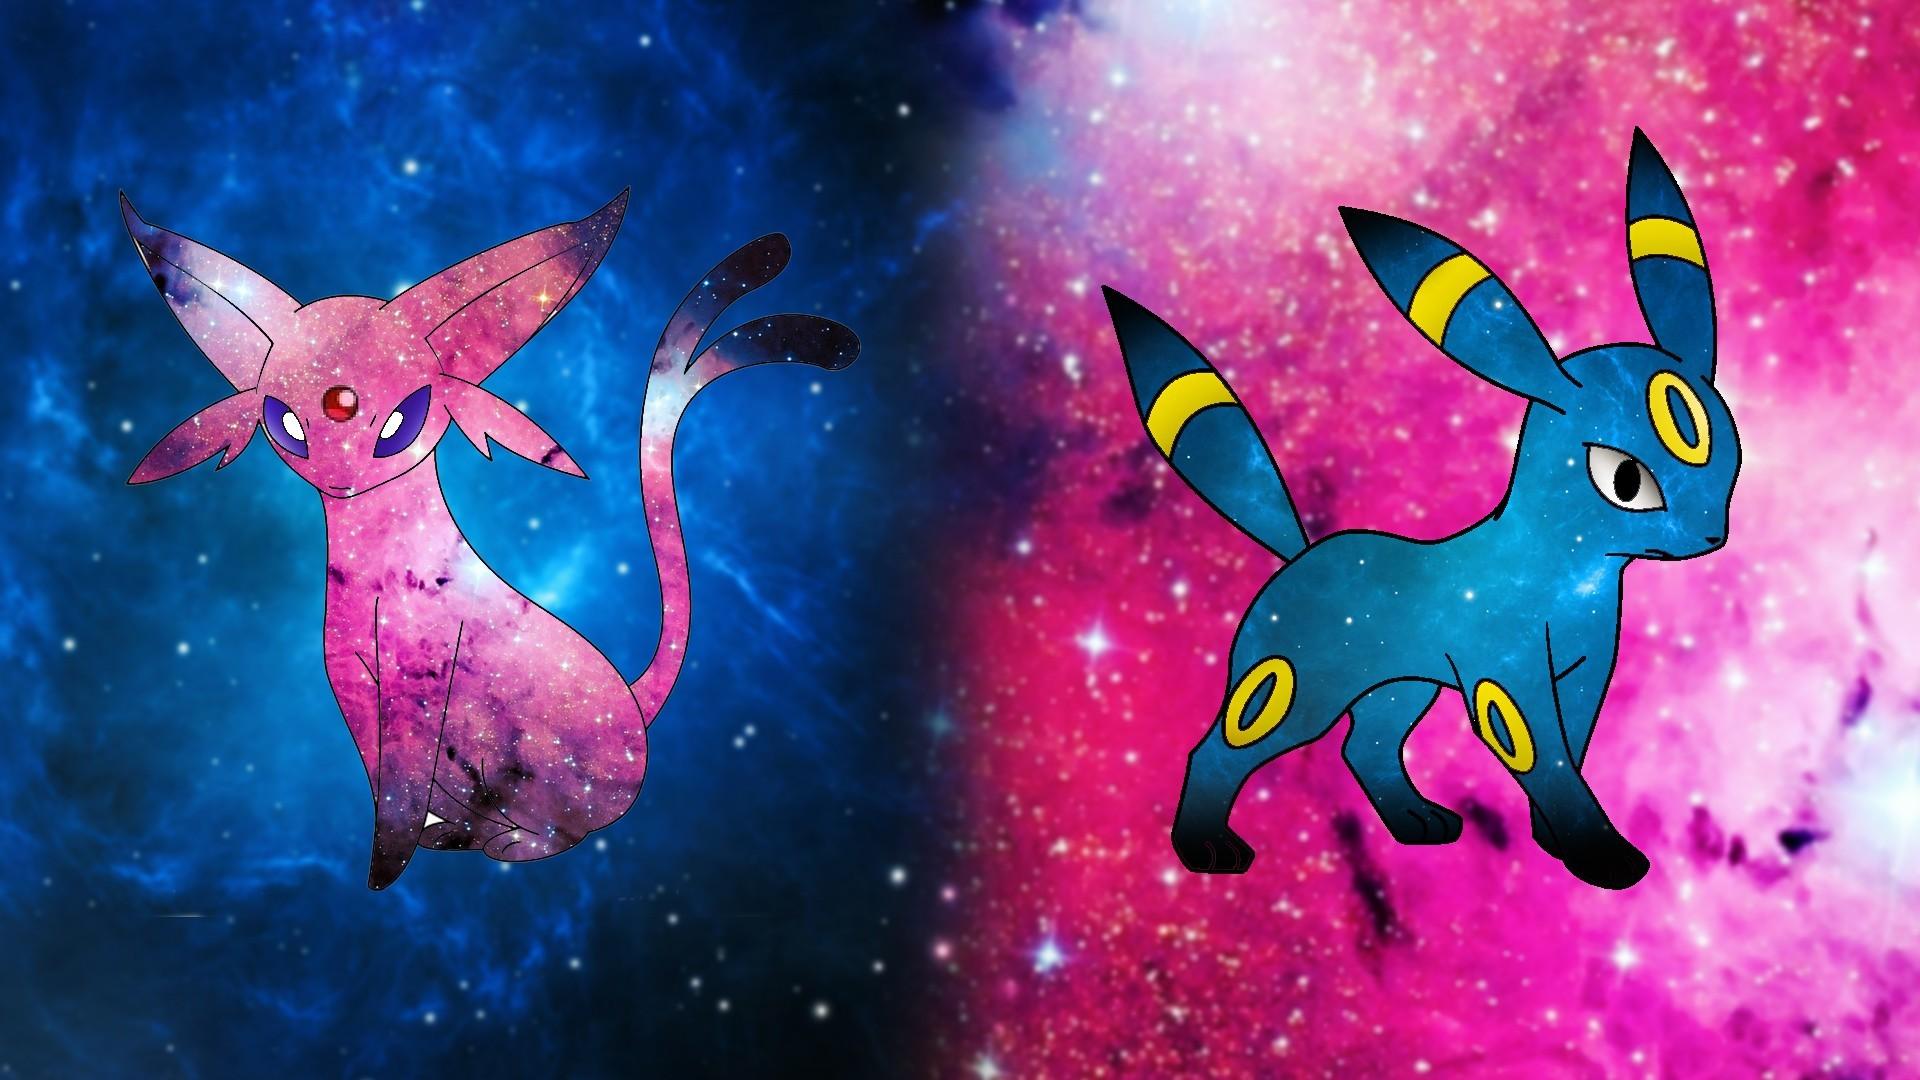 Anime Pokémon space Espeon Umbreon Pikachu blue pink dog